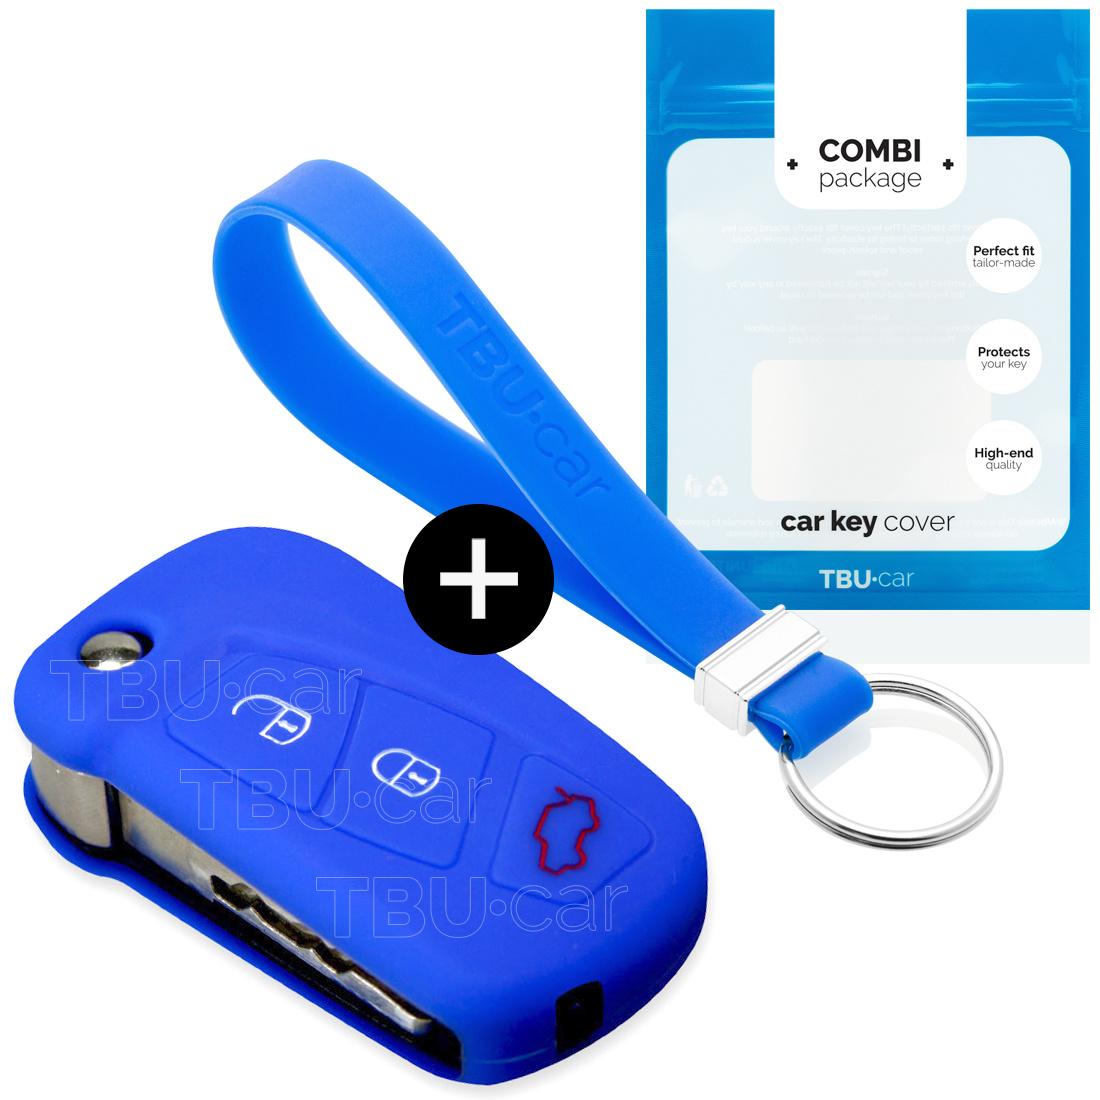 TBU car Autoschlüssel Hülle für Ford 3 Tasten (KA) - Schutzhülle aus Silikon - Auto Schlüsselhülle Cover in Blau